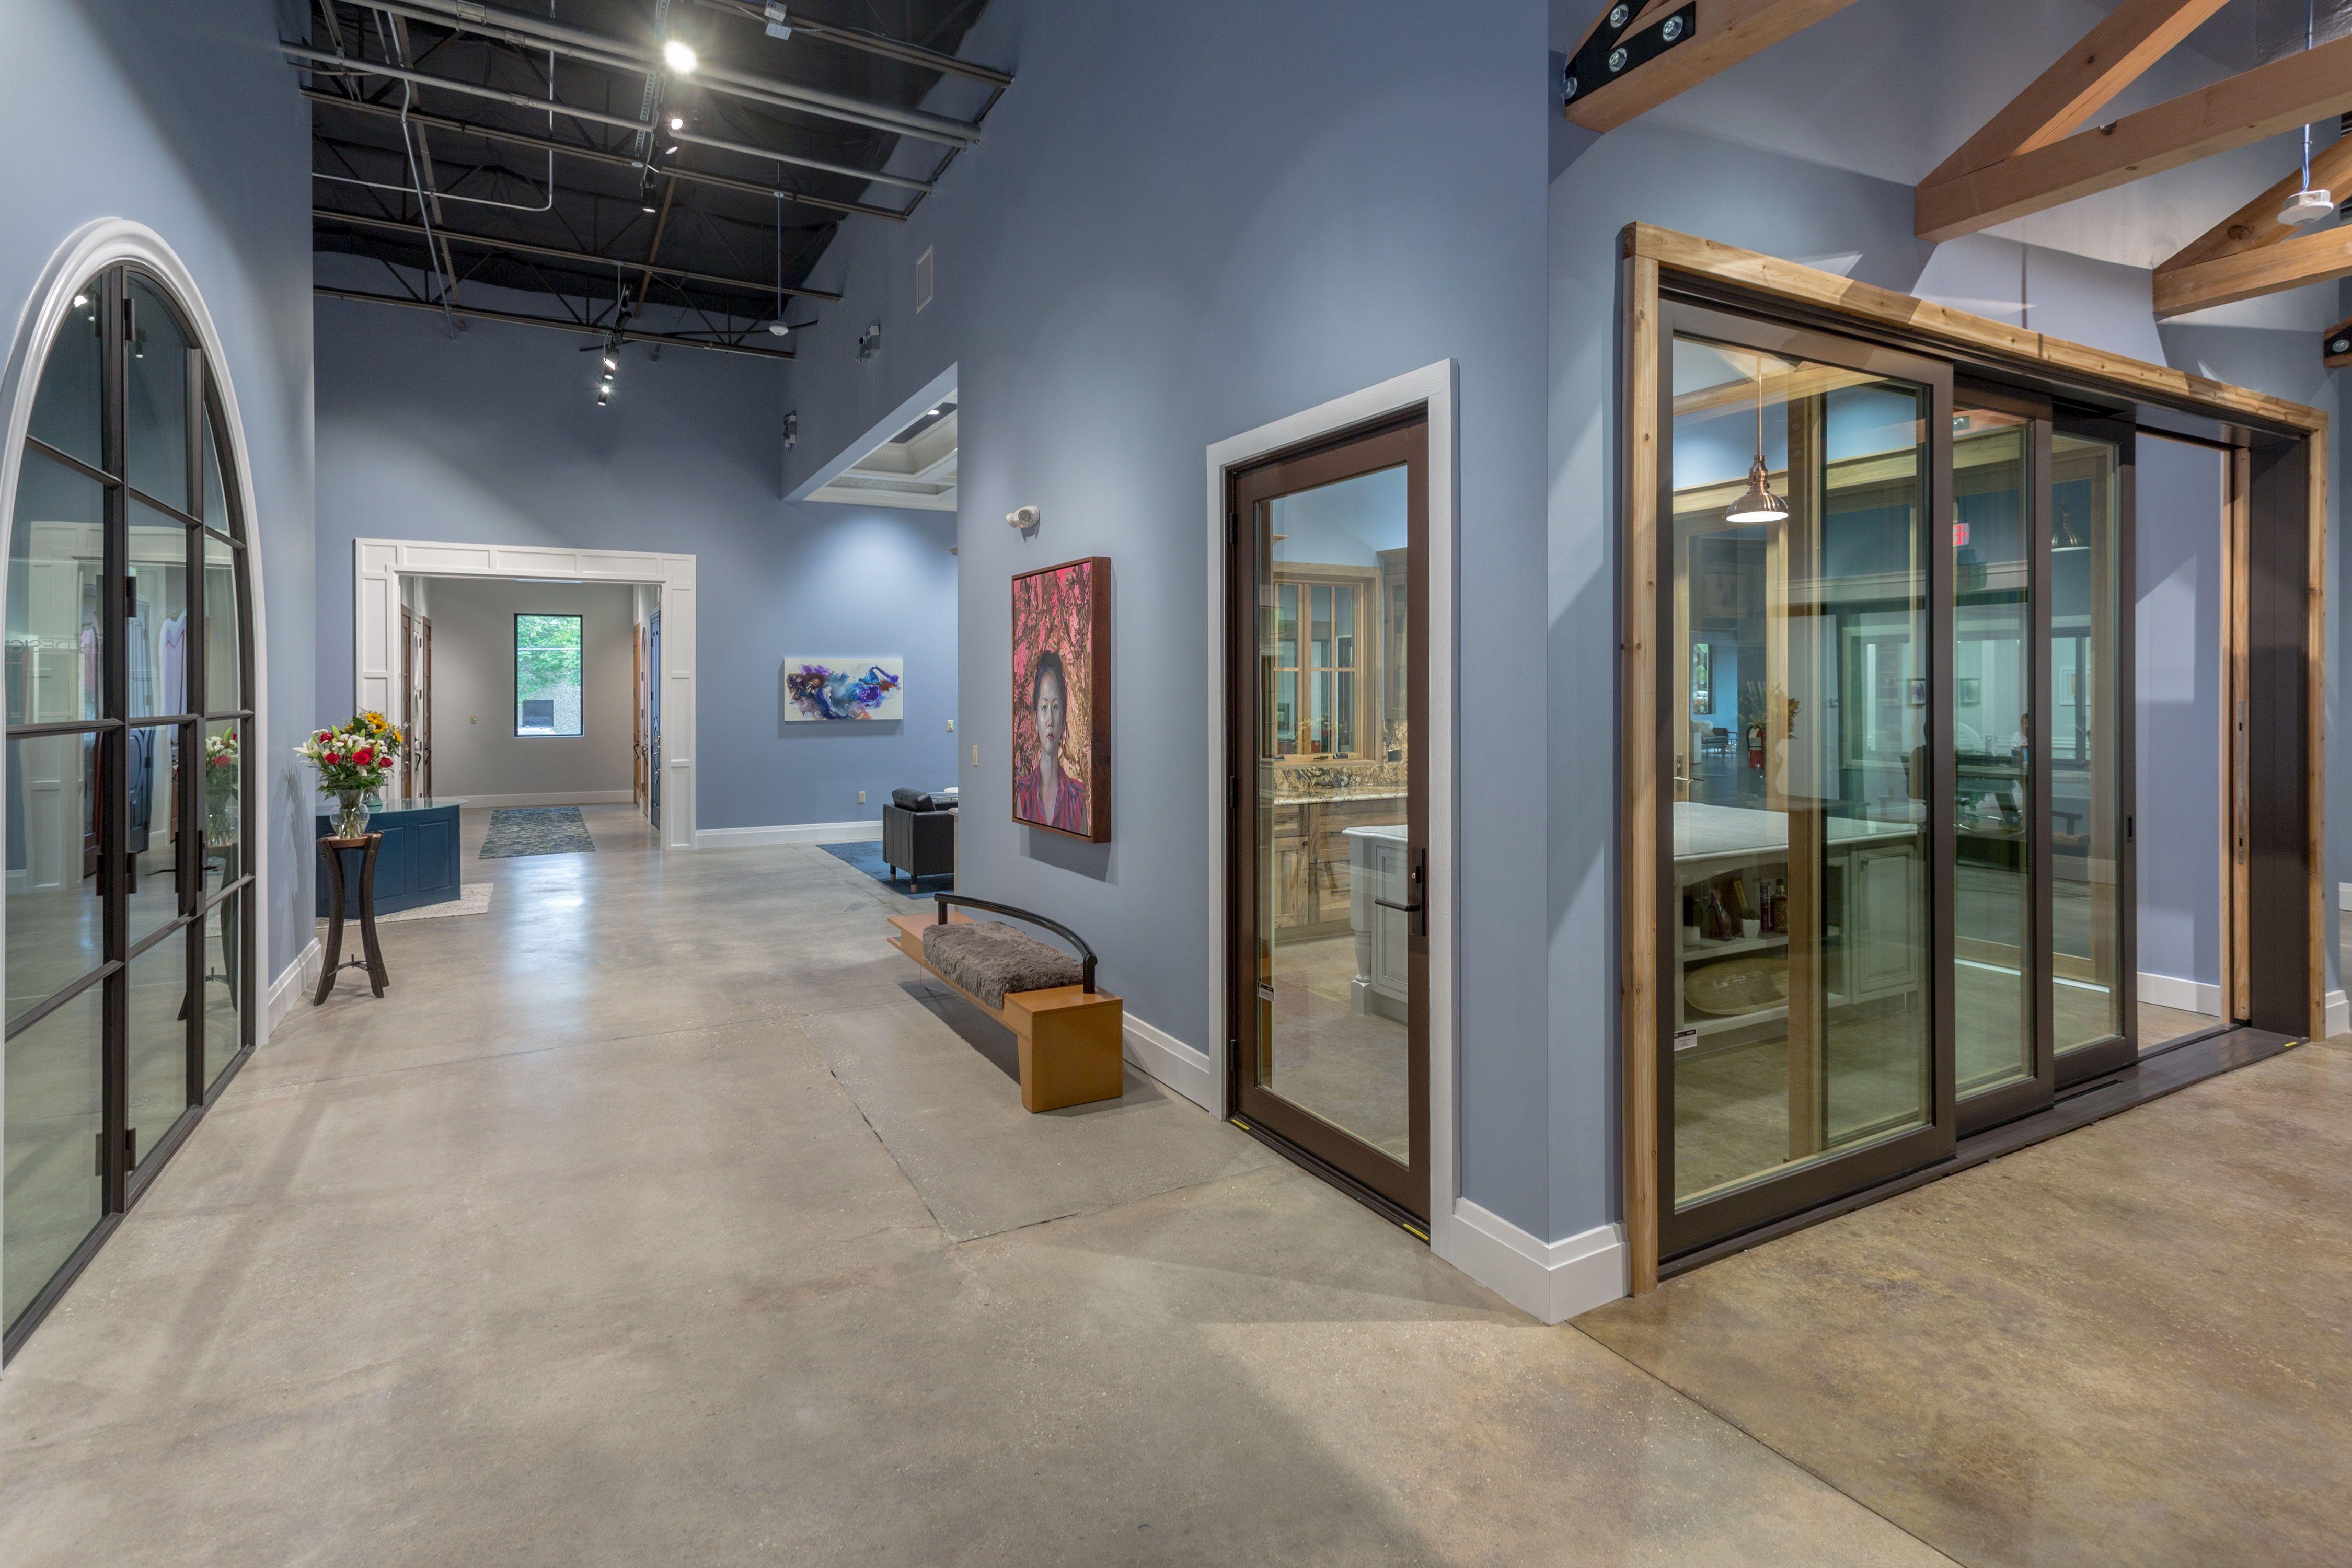 Exterior Door Inspiration Bmc Design Center Home Design Magazines Showroom Design Design